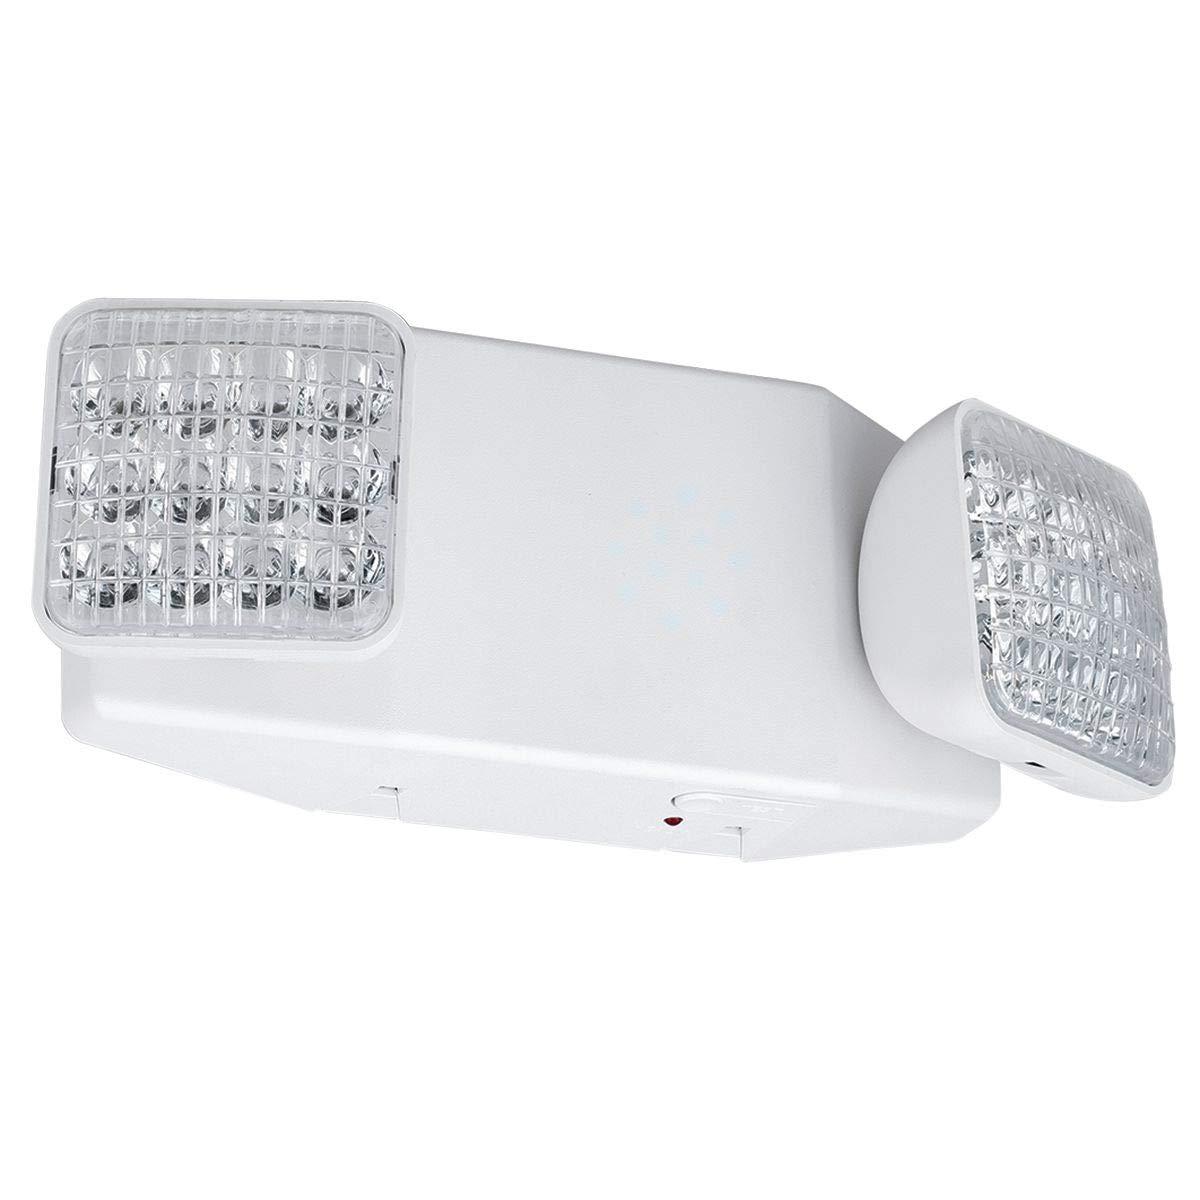 LED Emergency Light with 8 Ultra Bright LEDsper Head